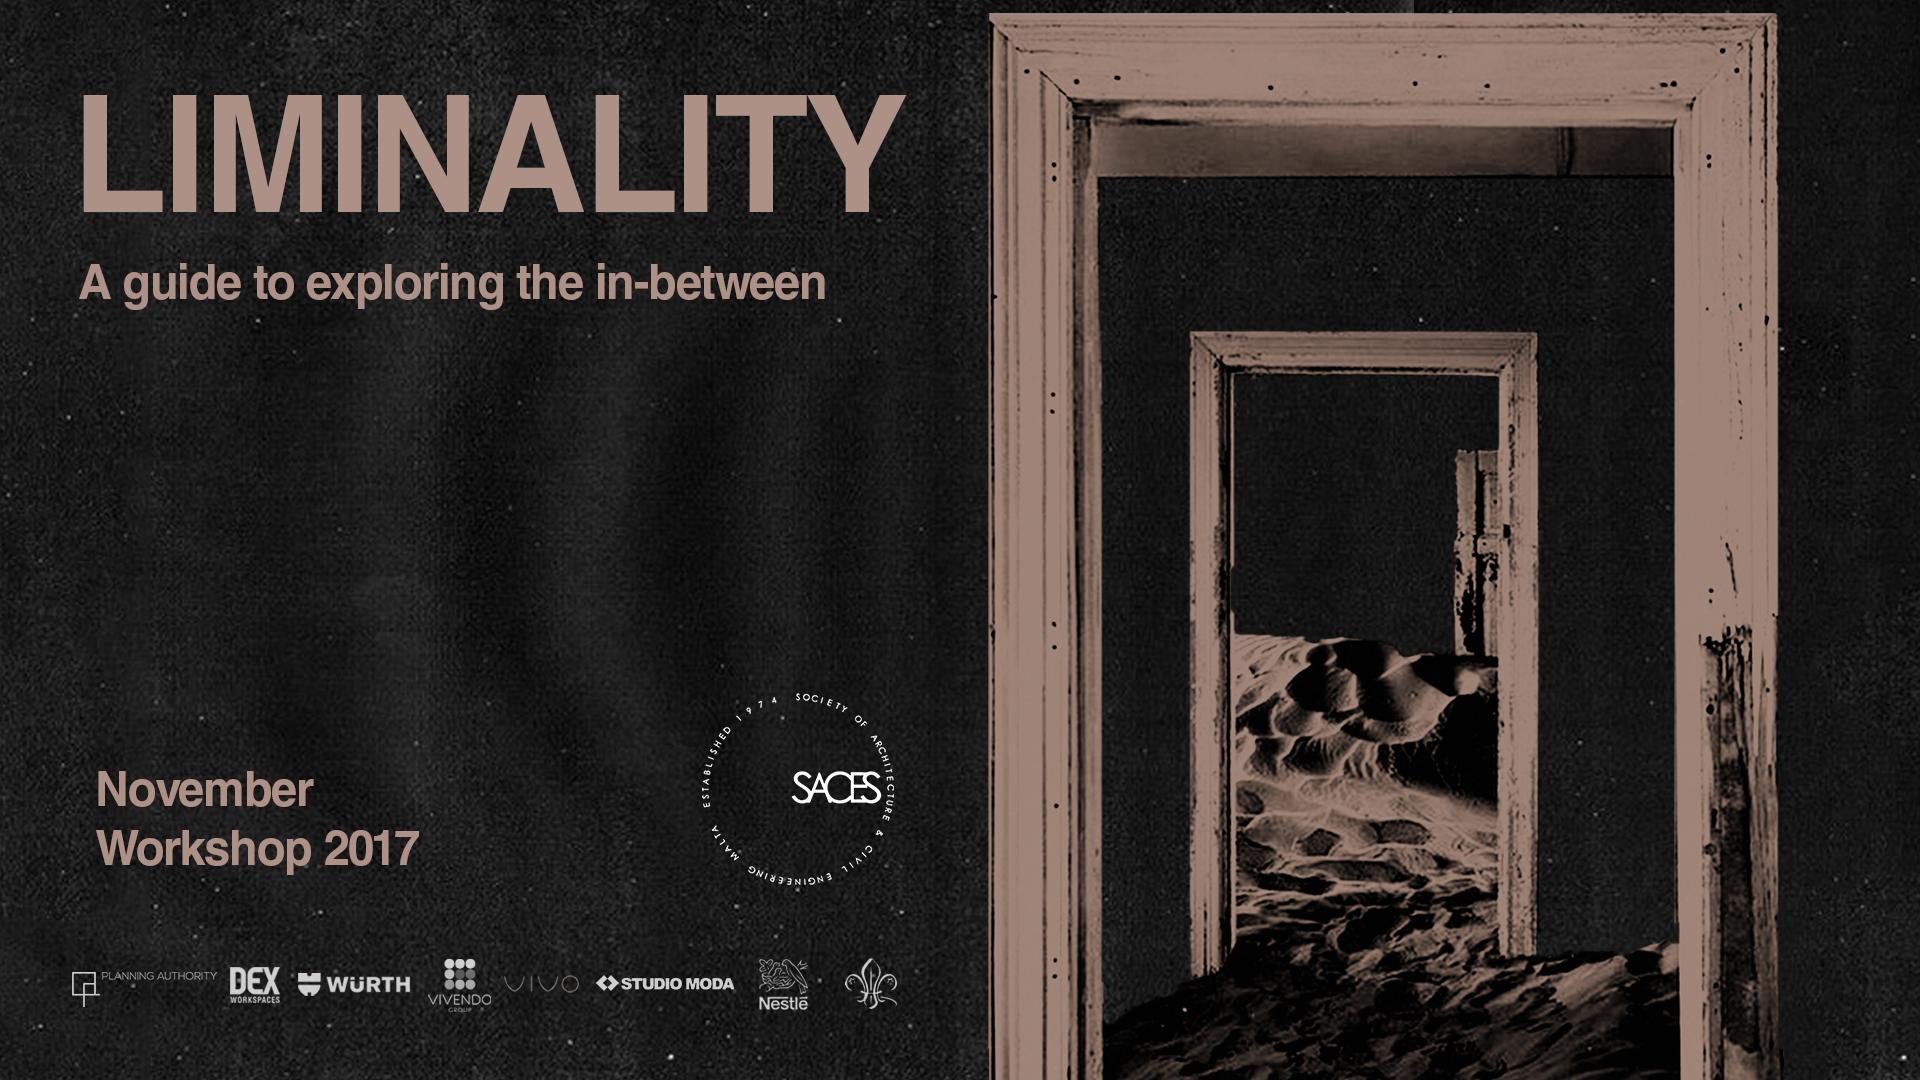 liminality.jpg